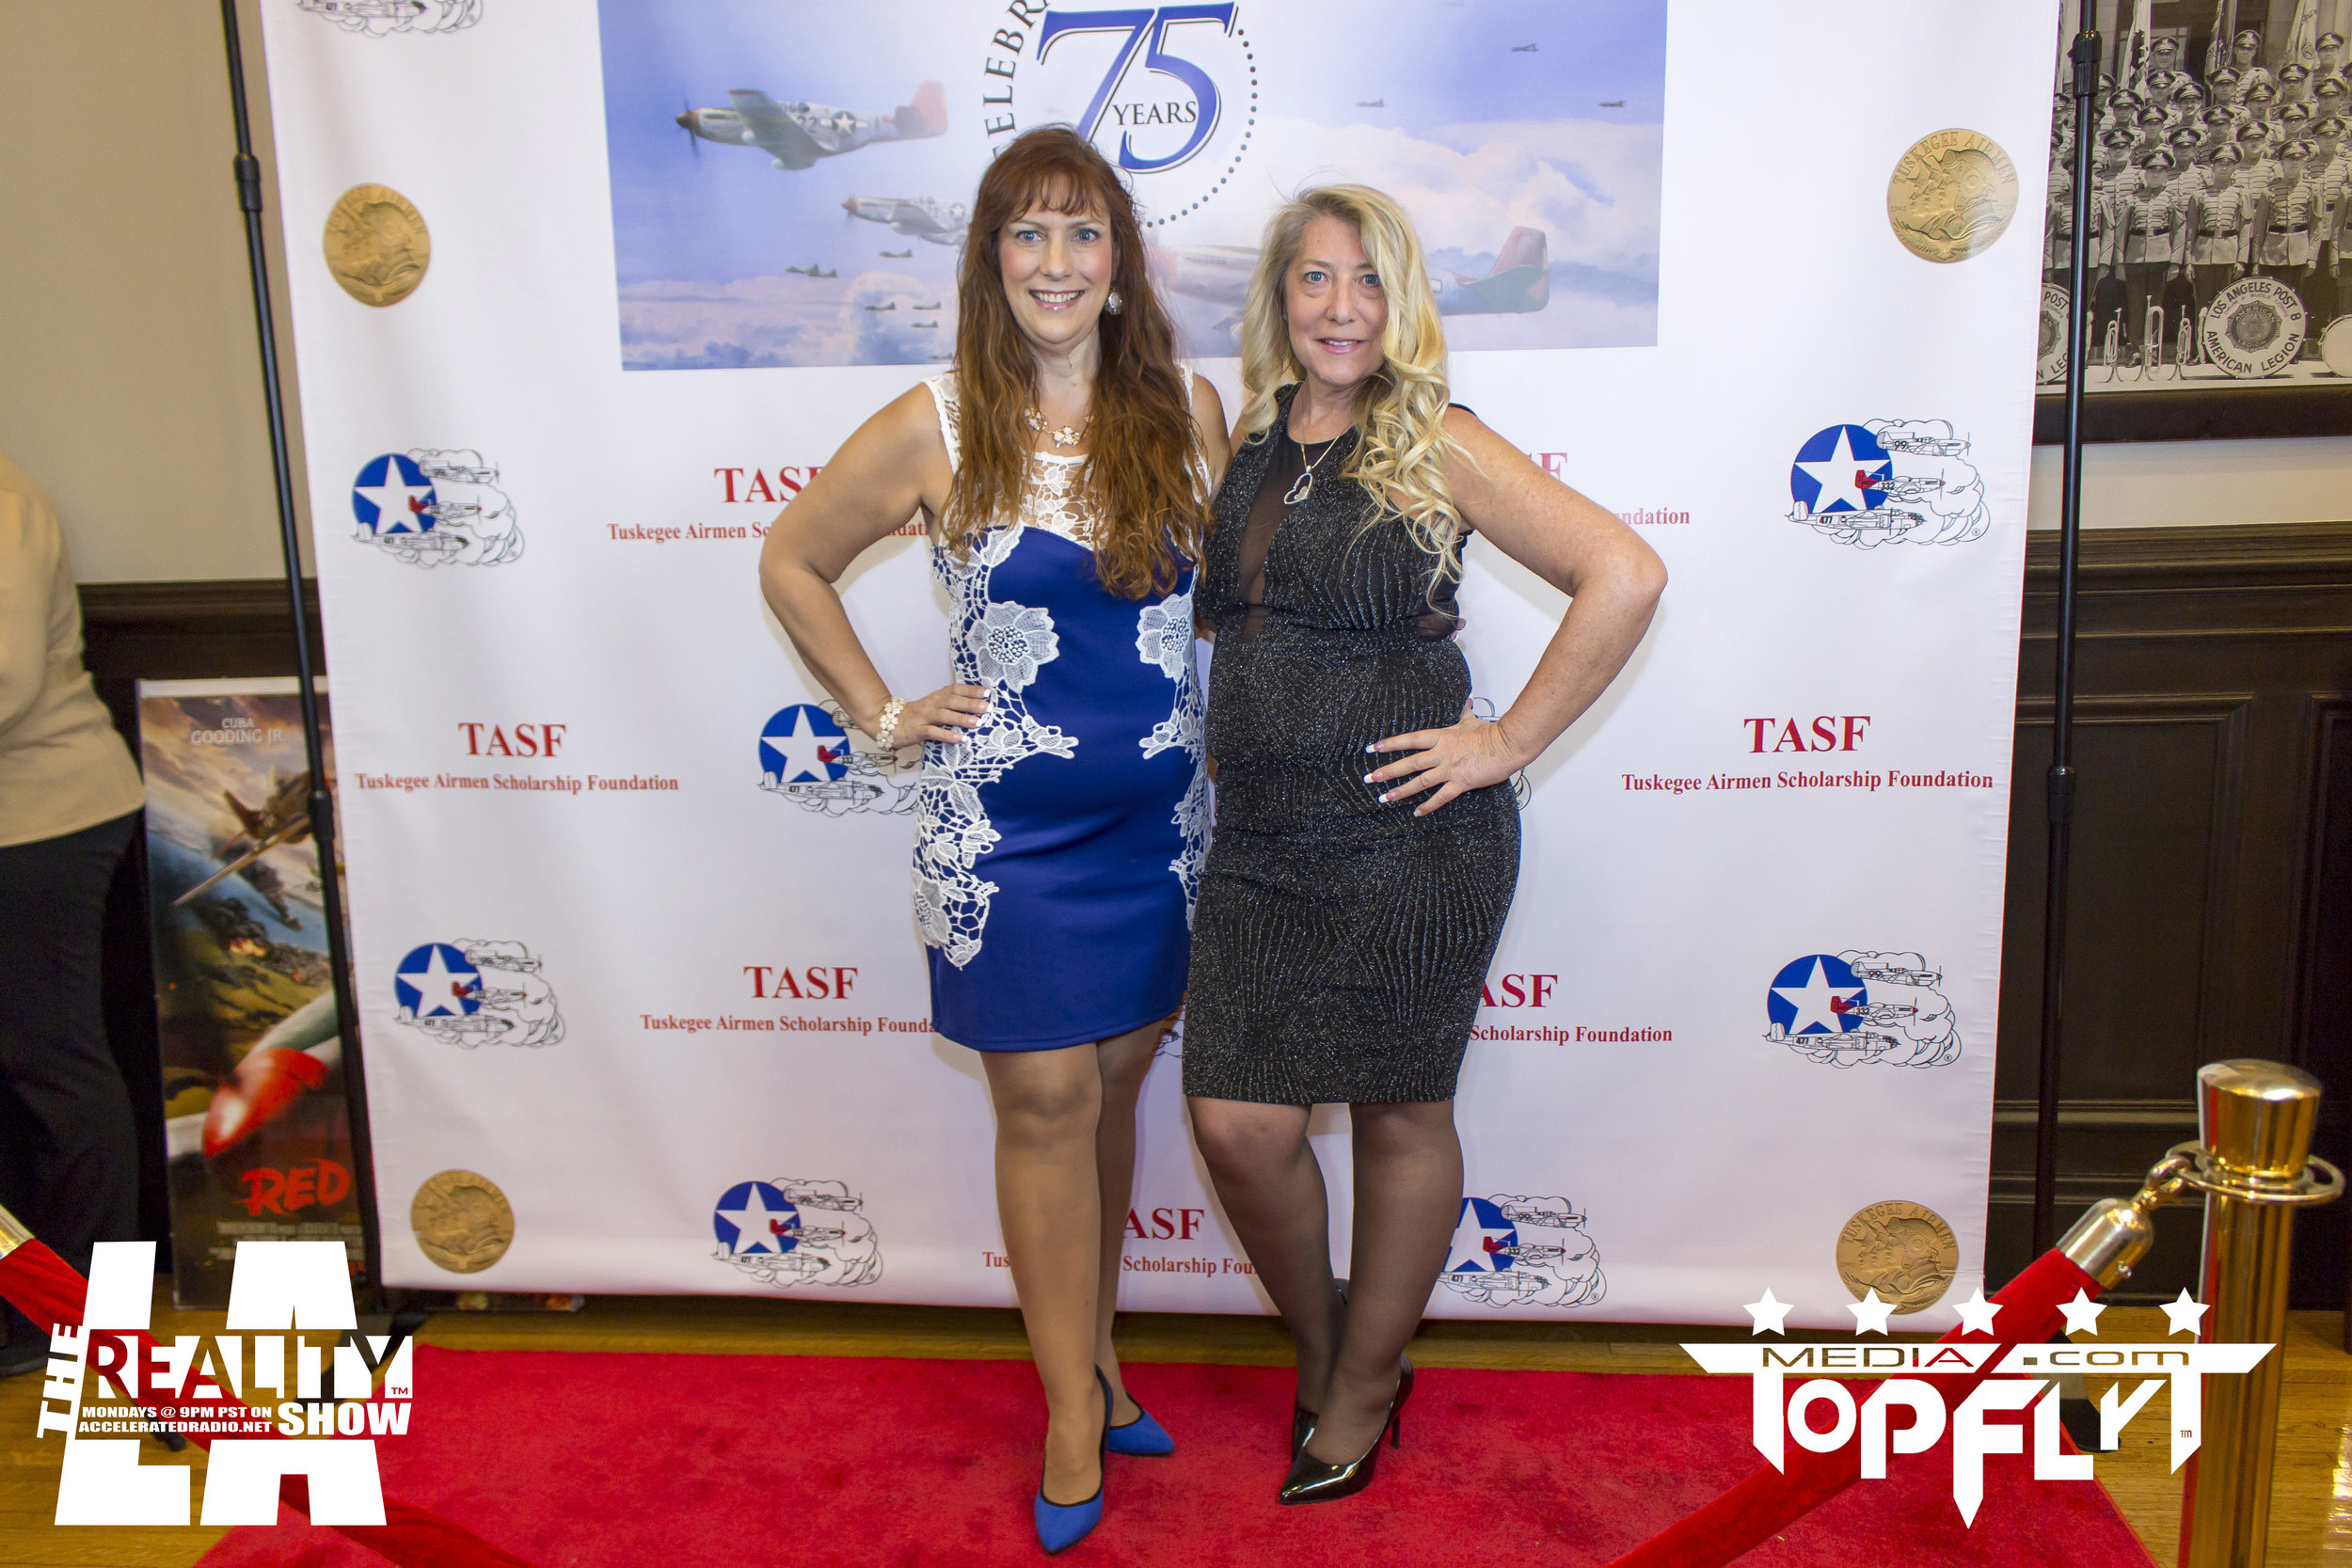 The Reality Show LA - Tuskegee Airmen 75th Anniversary VIP Reception_38.jpg